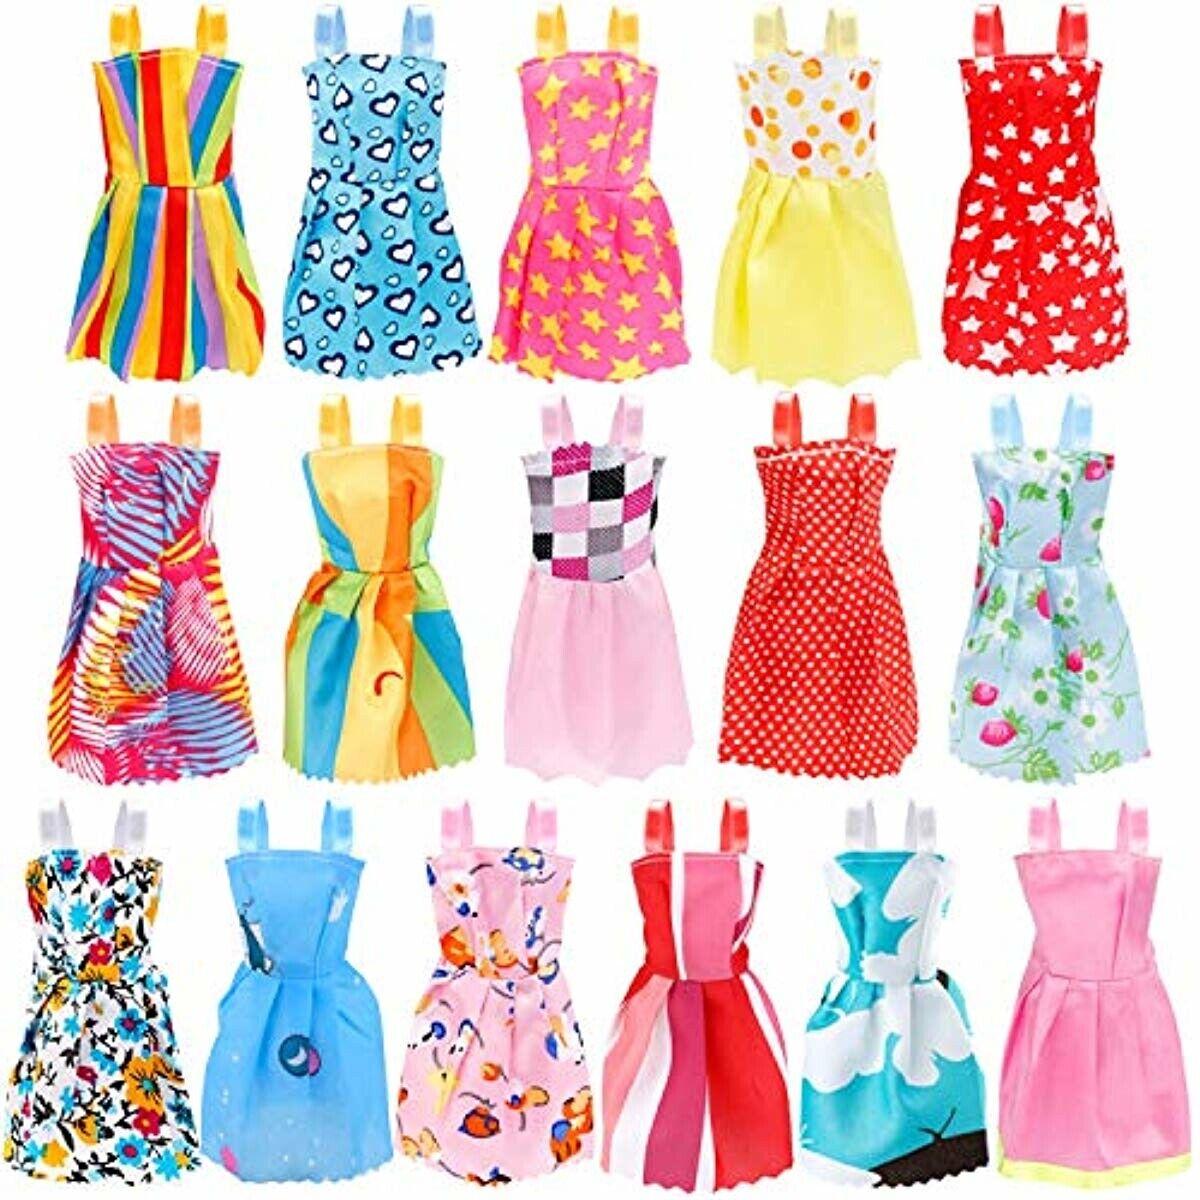 73PCS For Barbie Doll Clothes Party Gown Shoes Bag Necklace Hanger Accessories 2